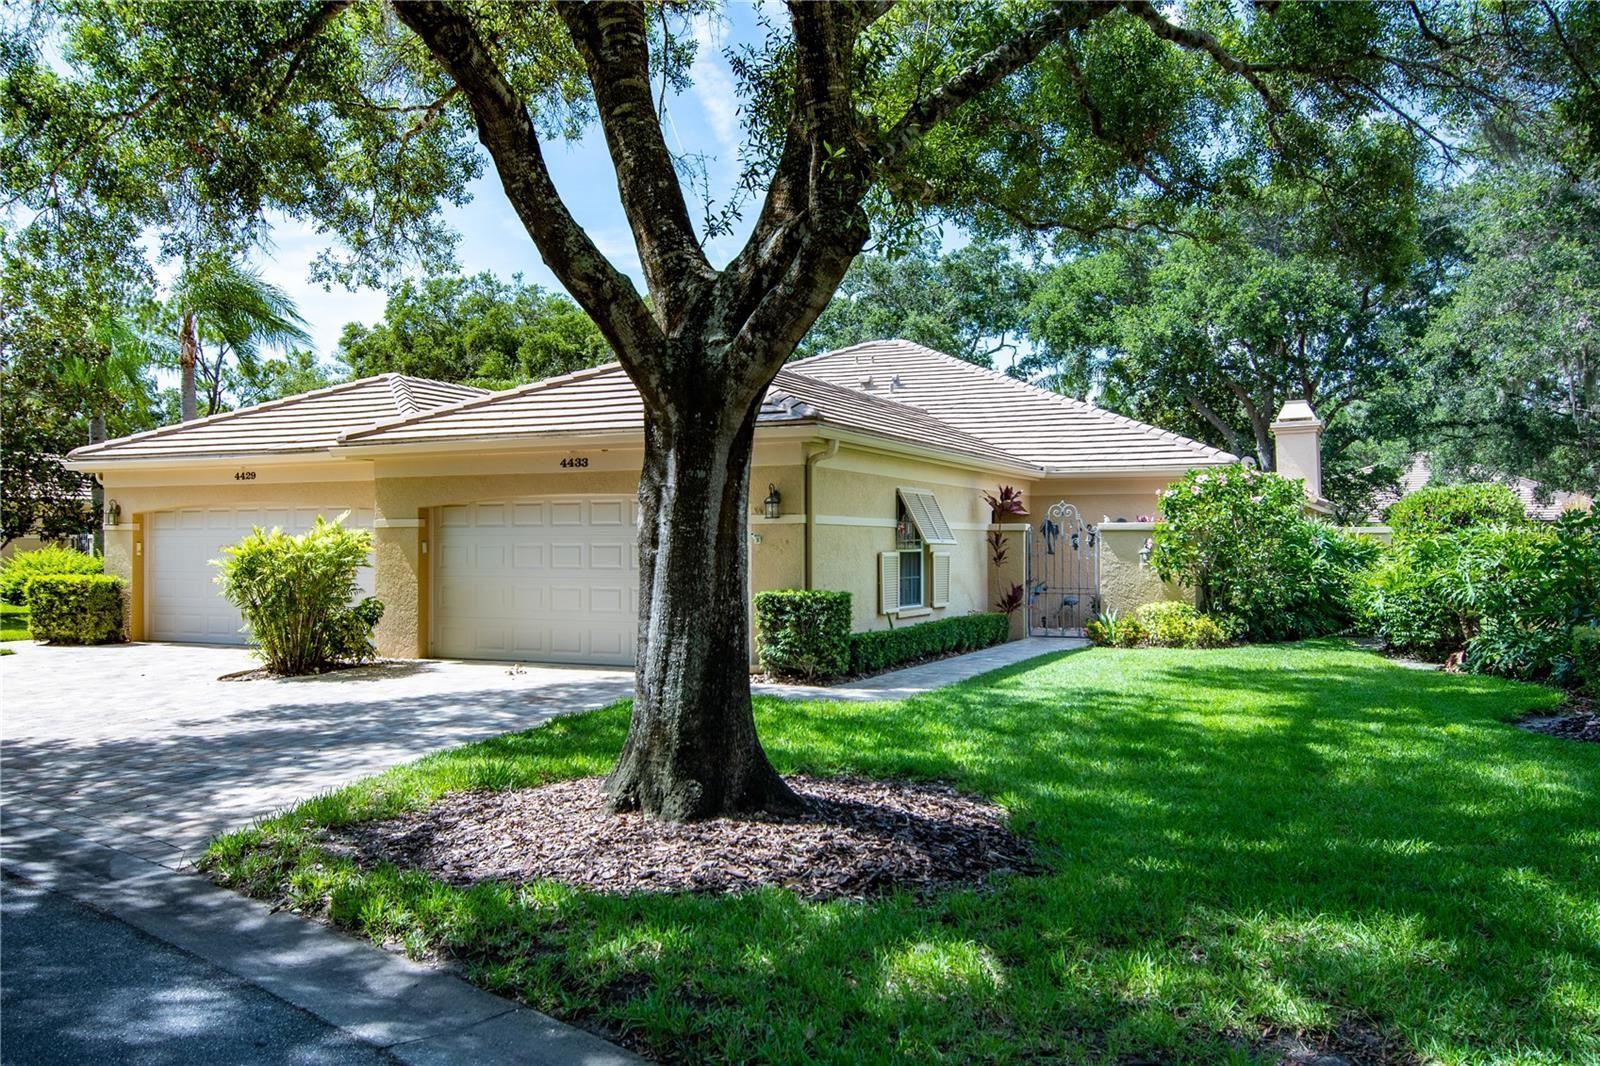 4433 OAKLEY GREENE #5, Sarasota, FL 34235 - #: U8126551